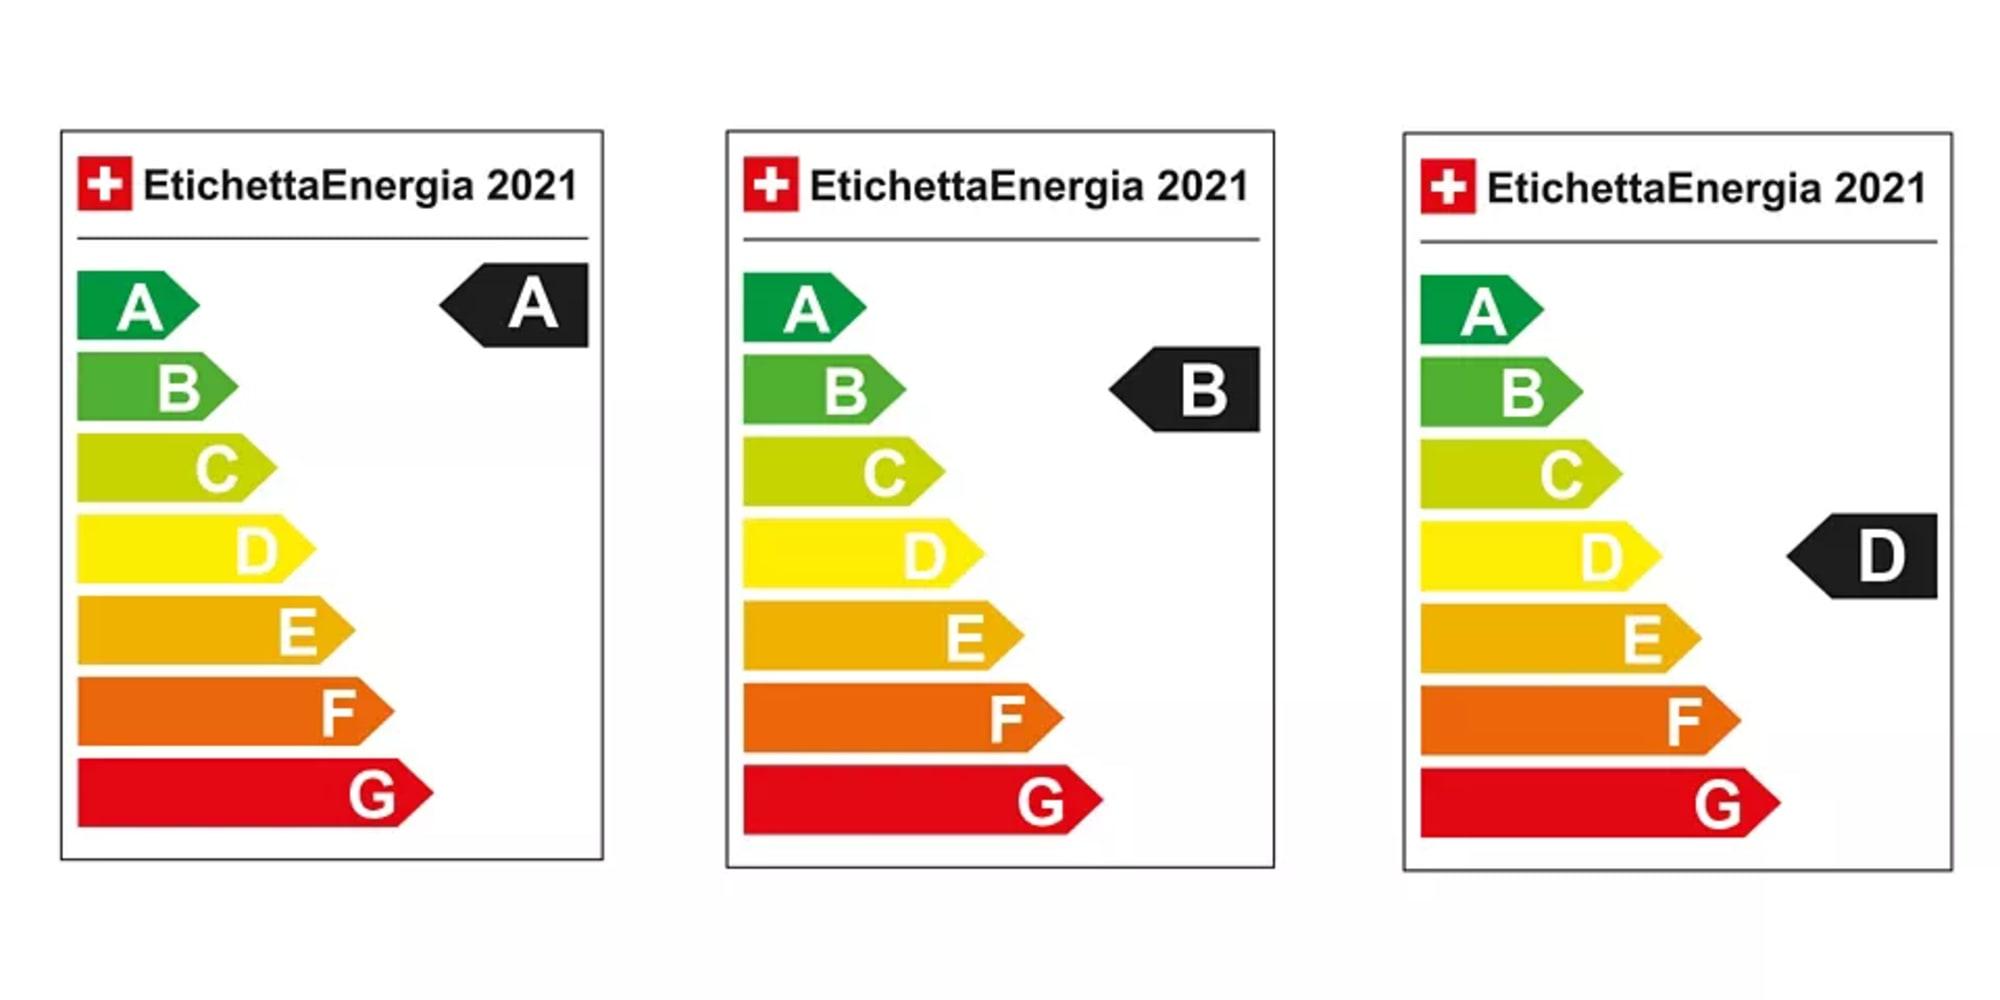 energieetikette_ABD_IT-2x1-1920x960 (1)